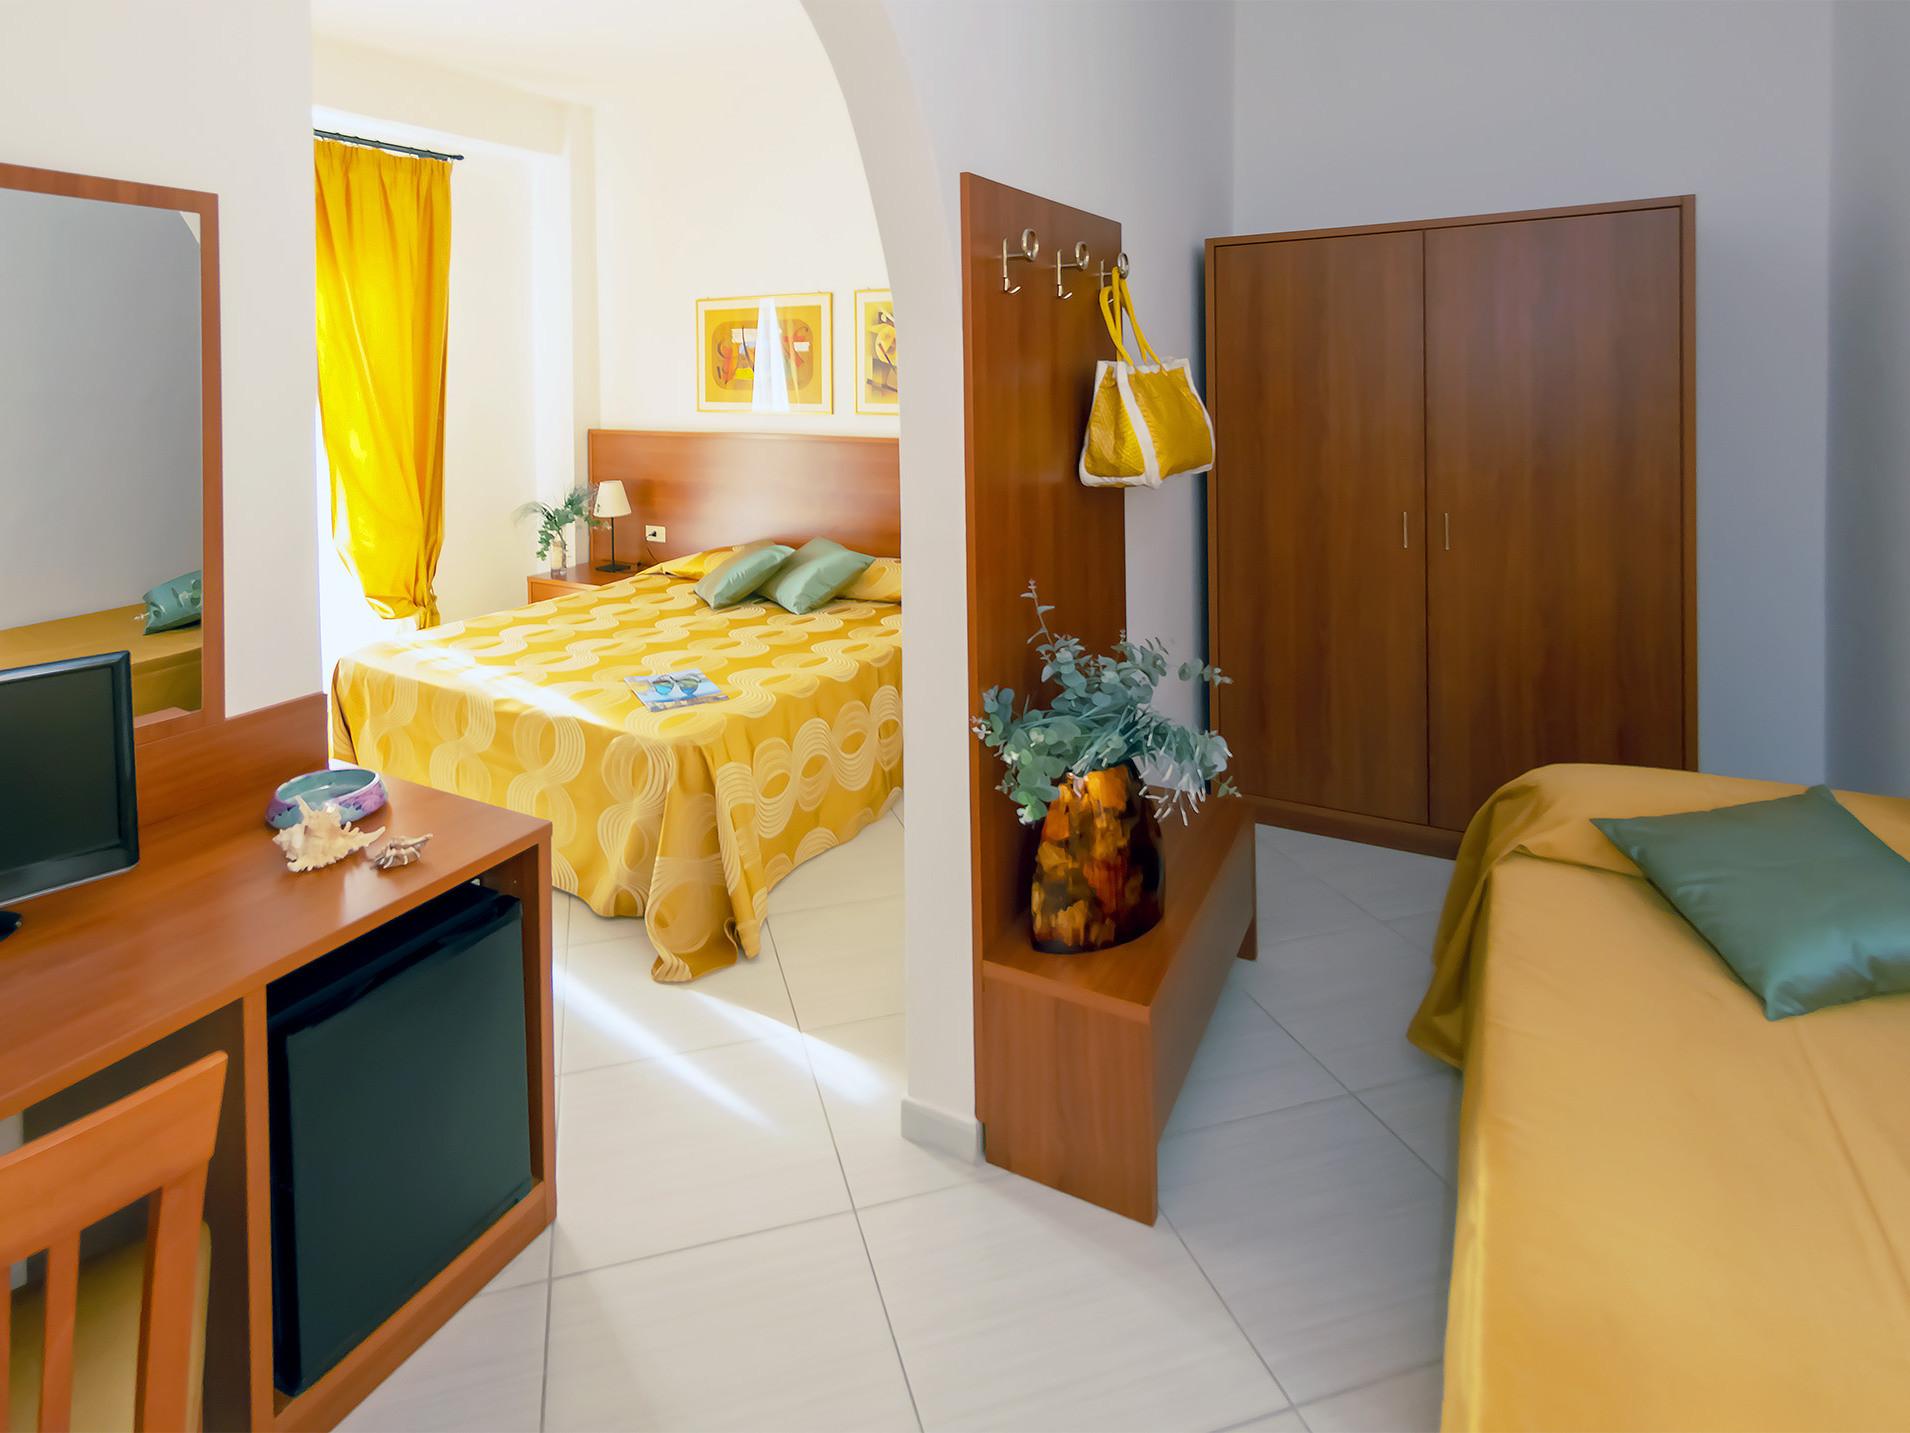 Tripla-Gialla-Hotel-Solaria-2019.jpg